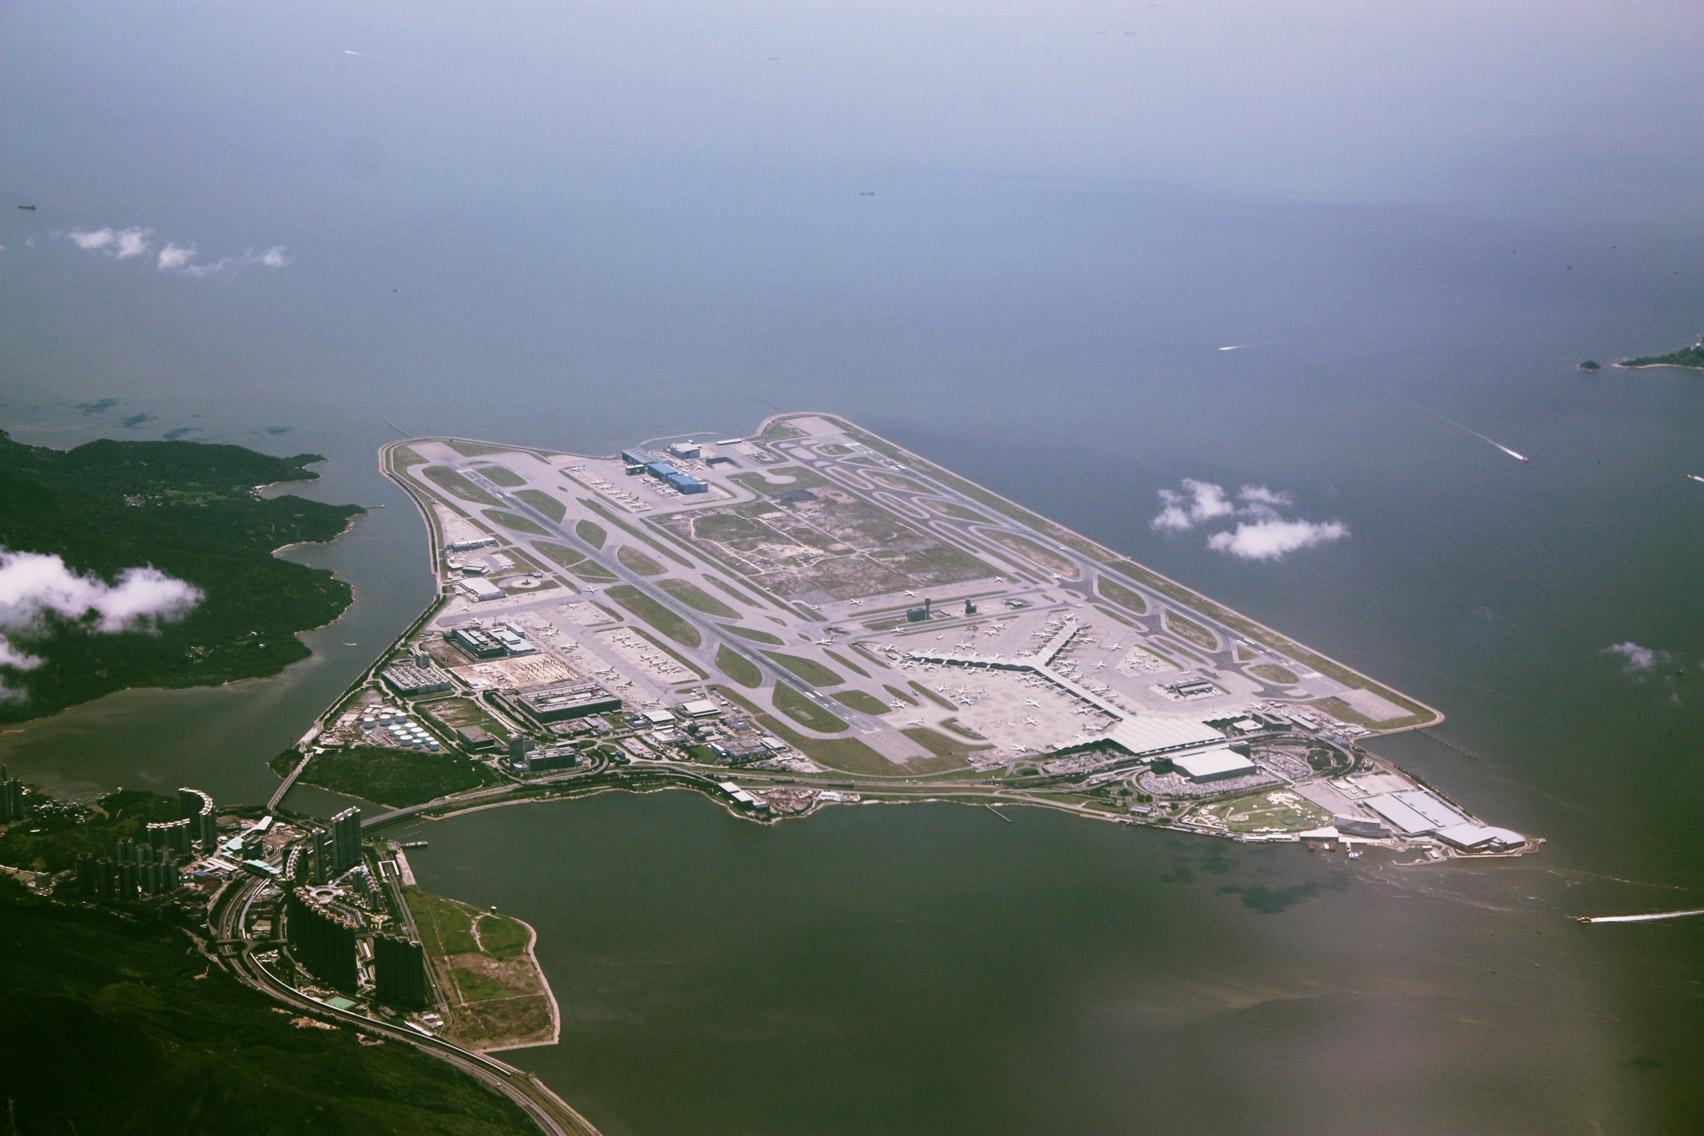 Lantau Tomorrow Vision: Hong Kong government plans £60 billion artificial island